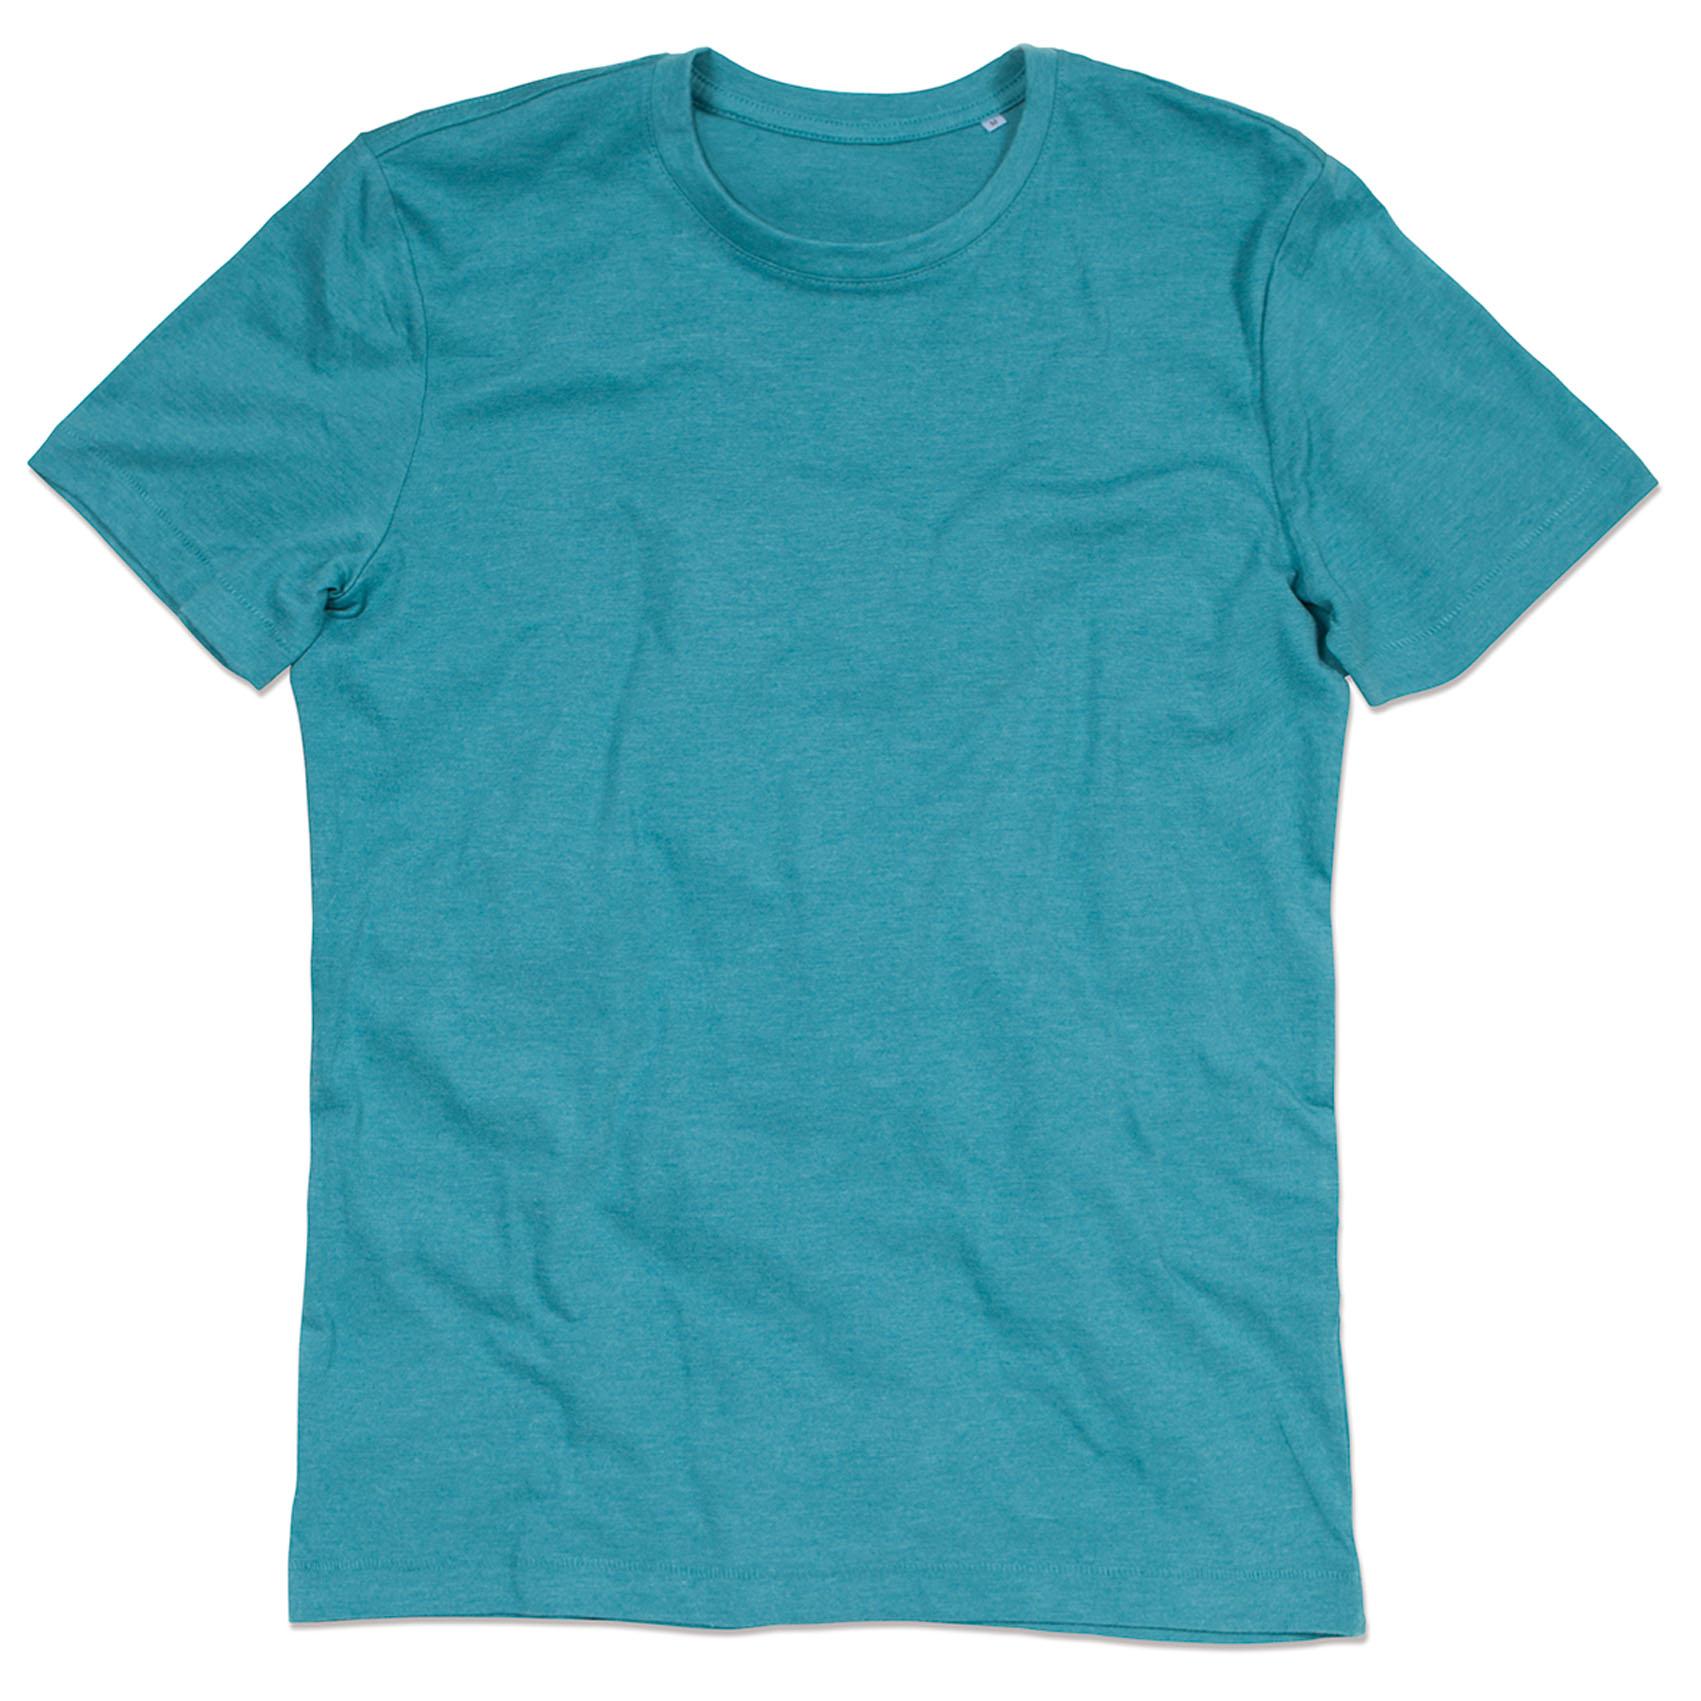 Stedman T-shirt Crewneck Luke for him